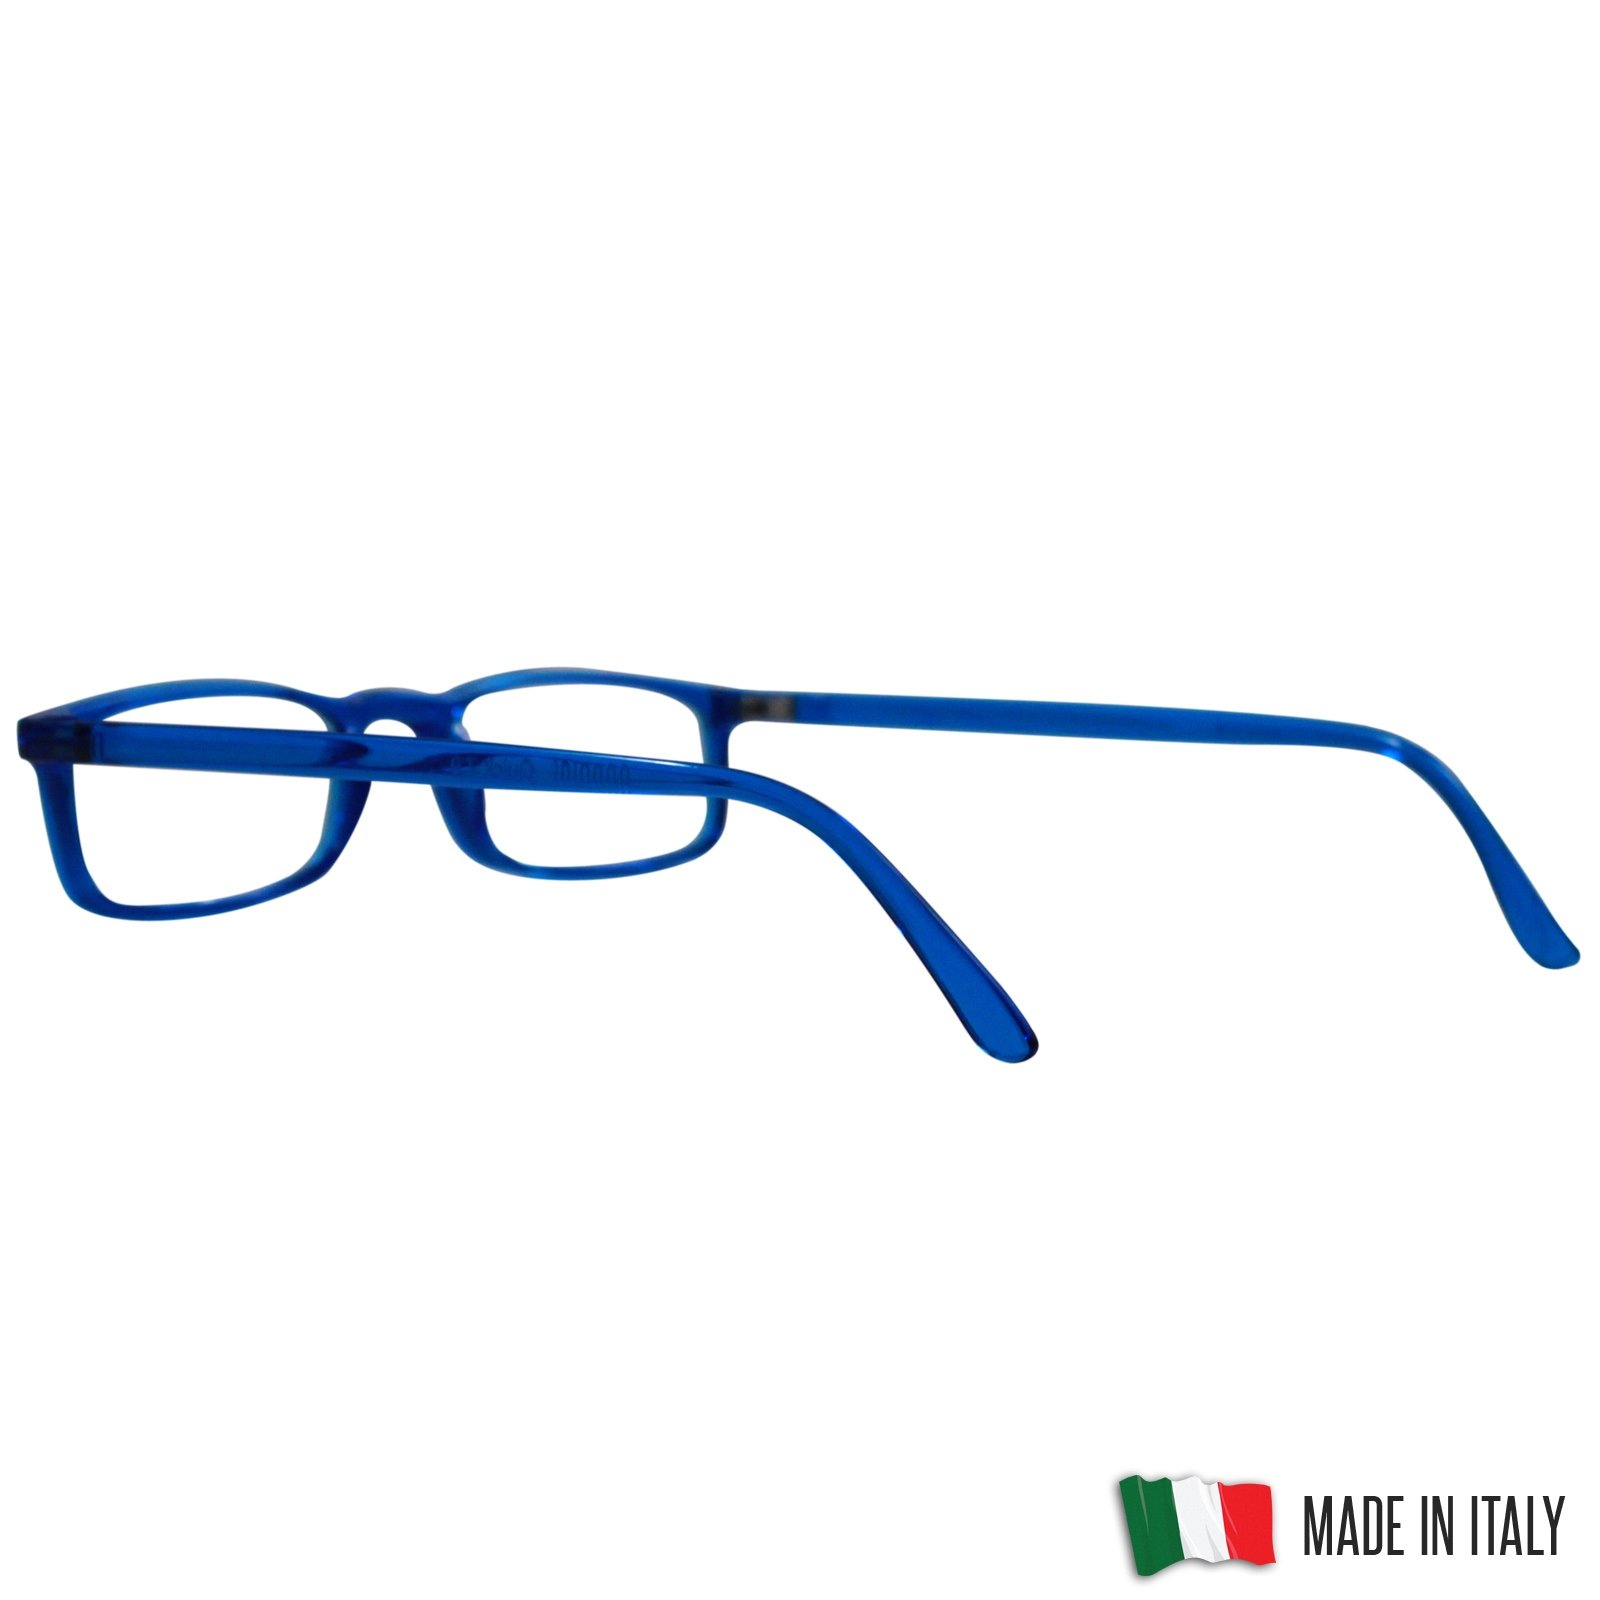 Reading Glasses Nannini Optics Vision Care Italian Fashion Readers - Blue 2.0